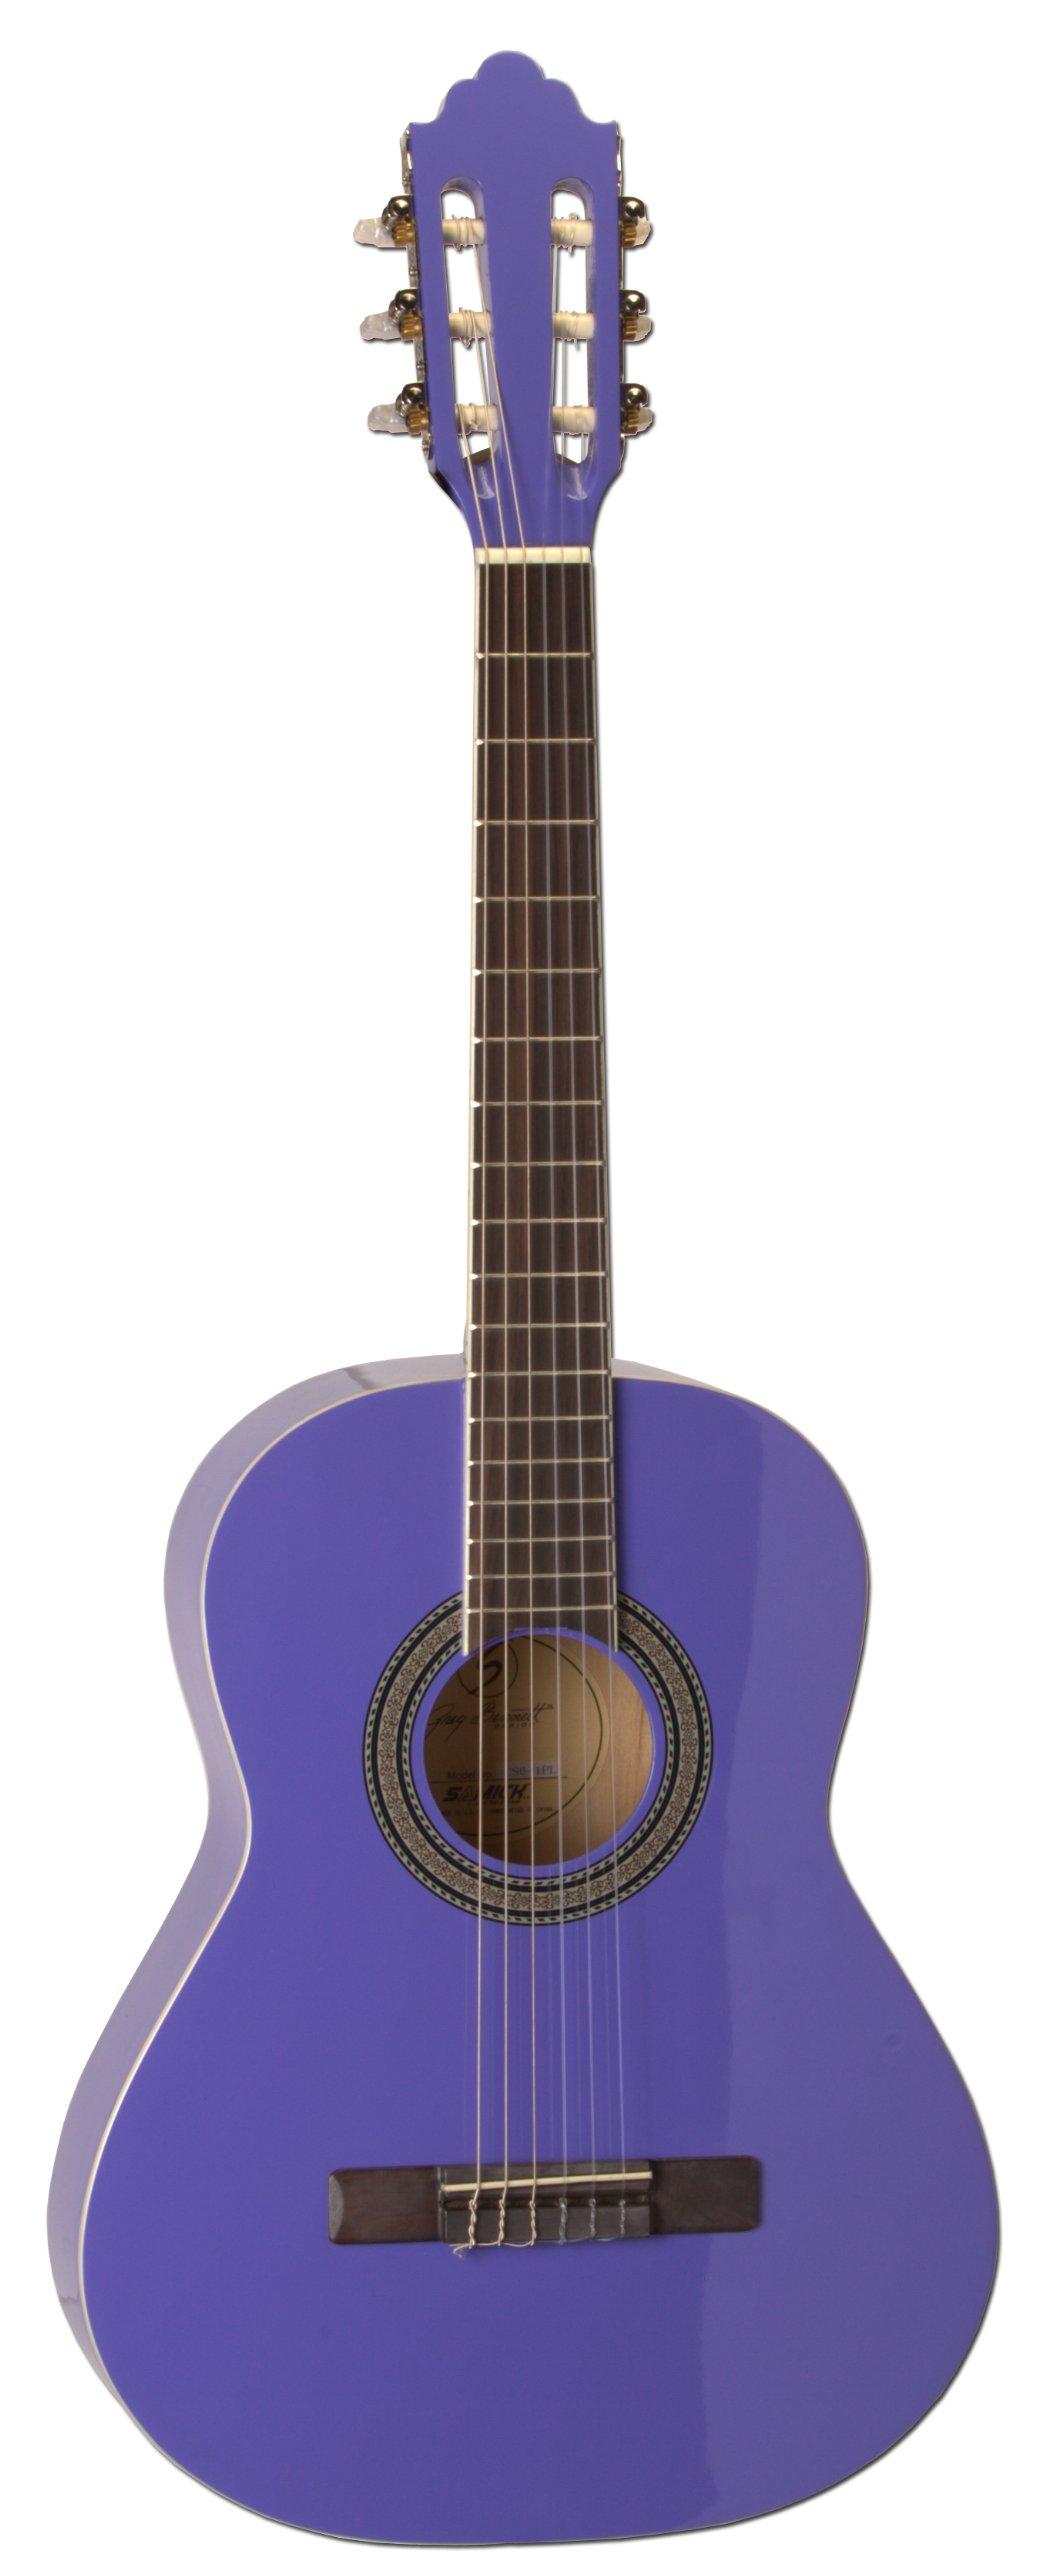 San Mateo San Mateo SCS6 PUR 36-Inch Classical Guitar, Purple